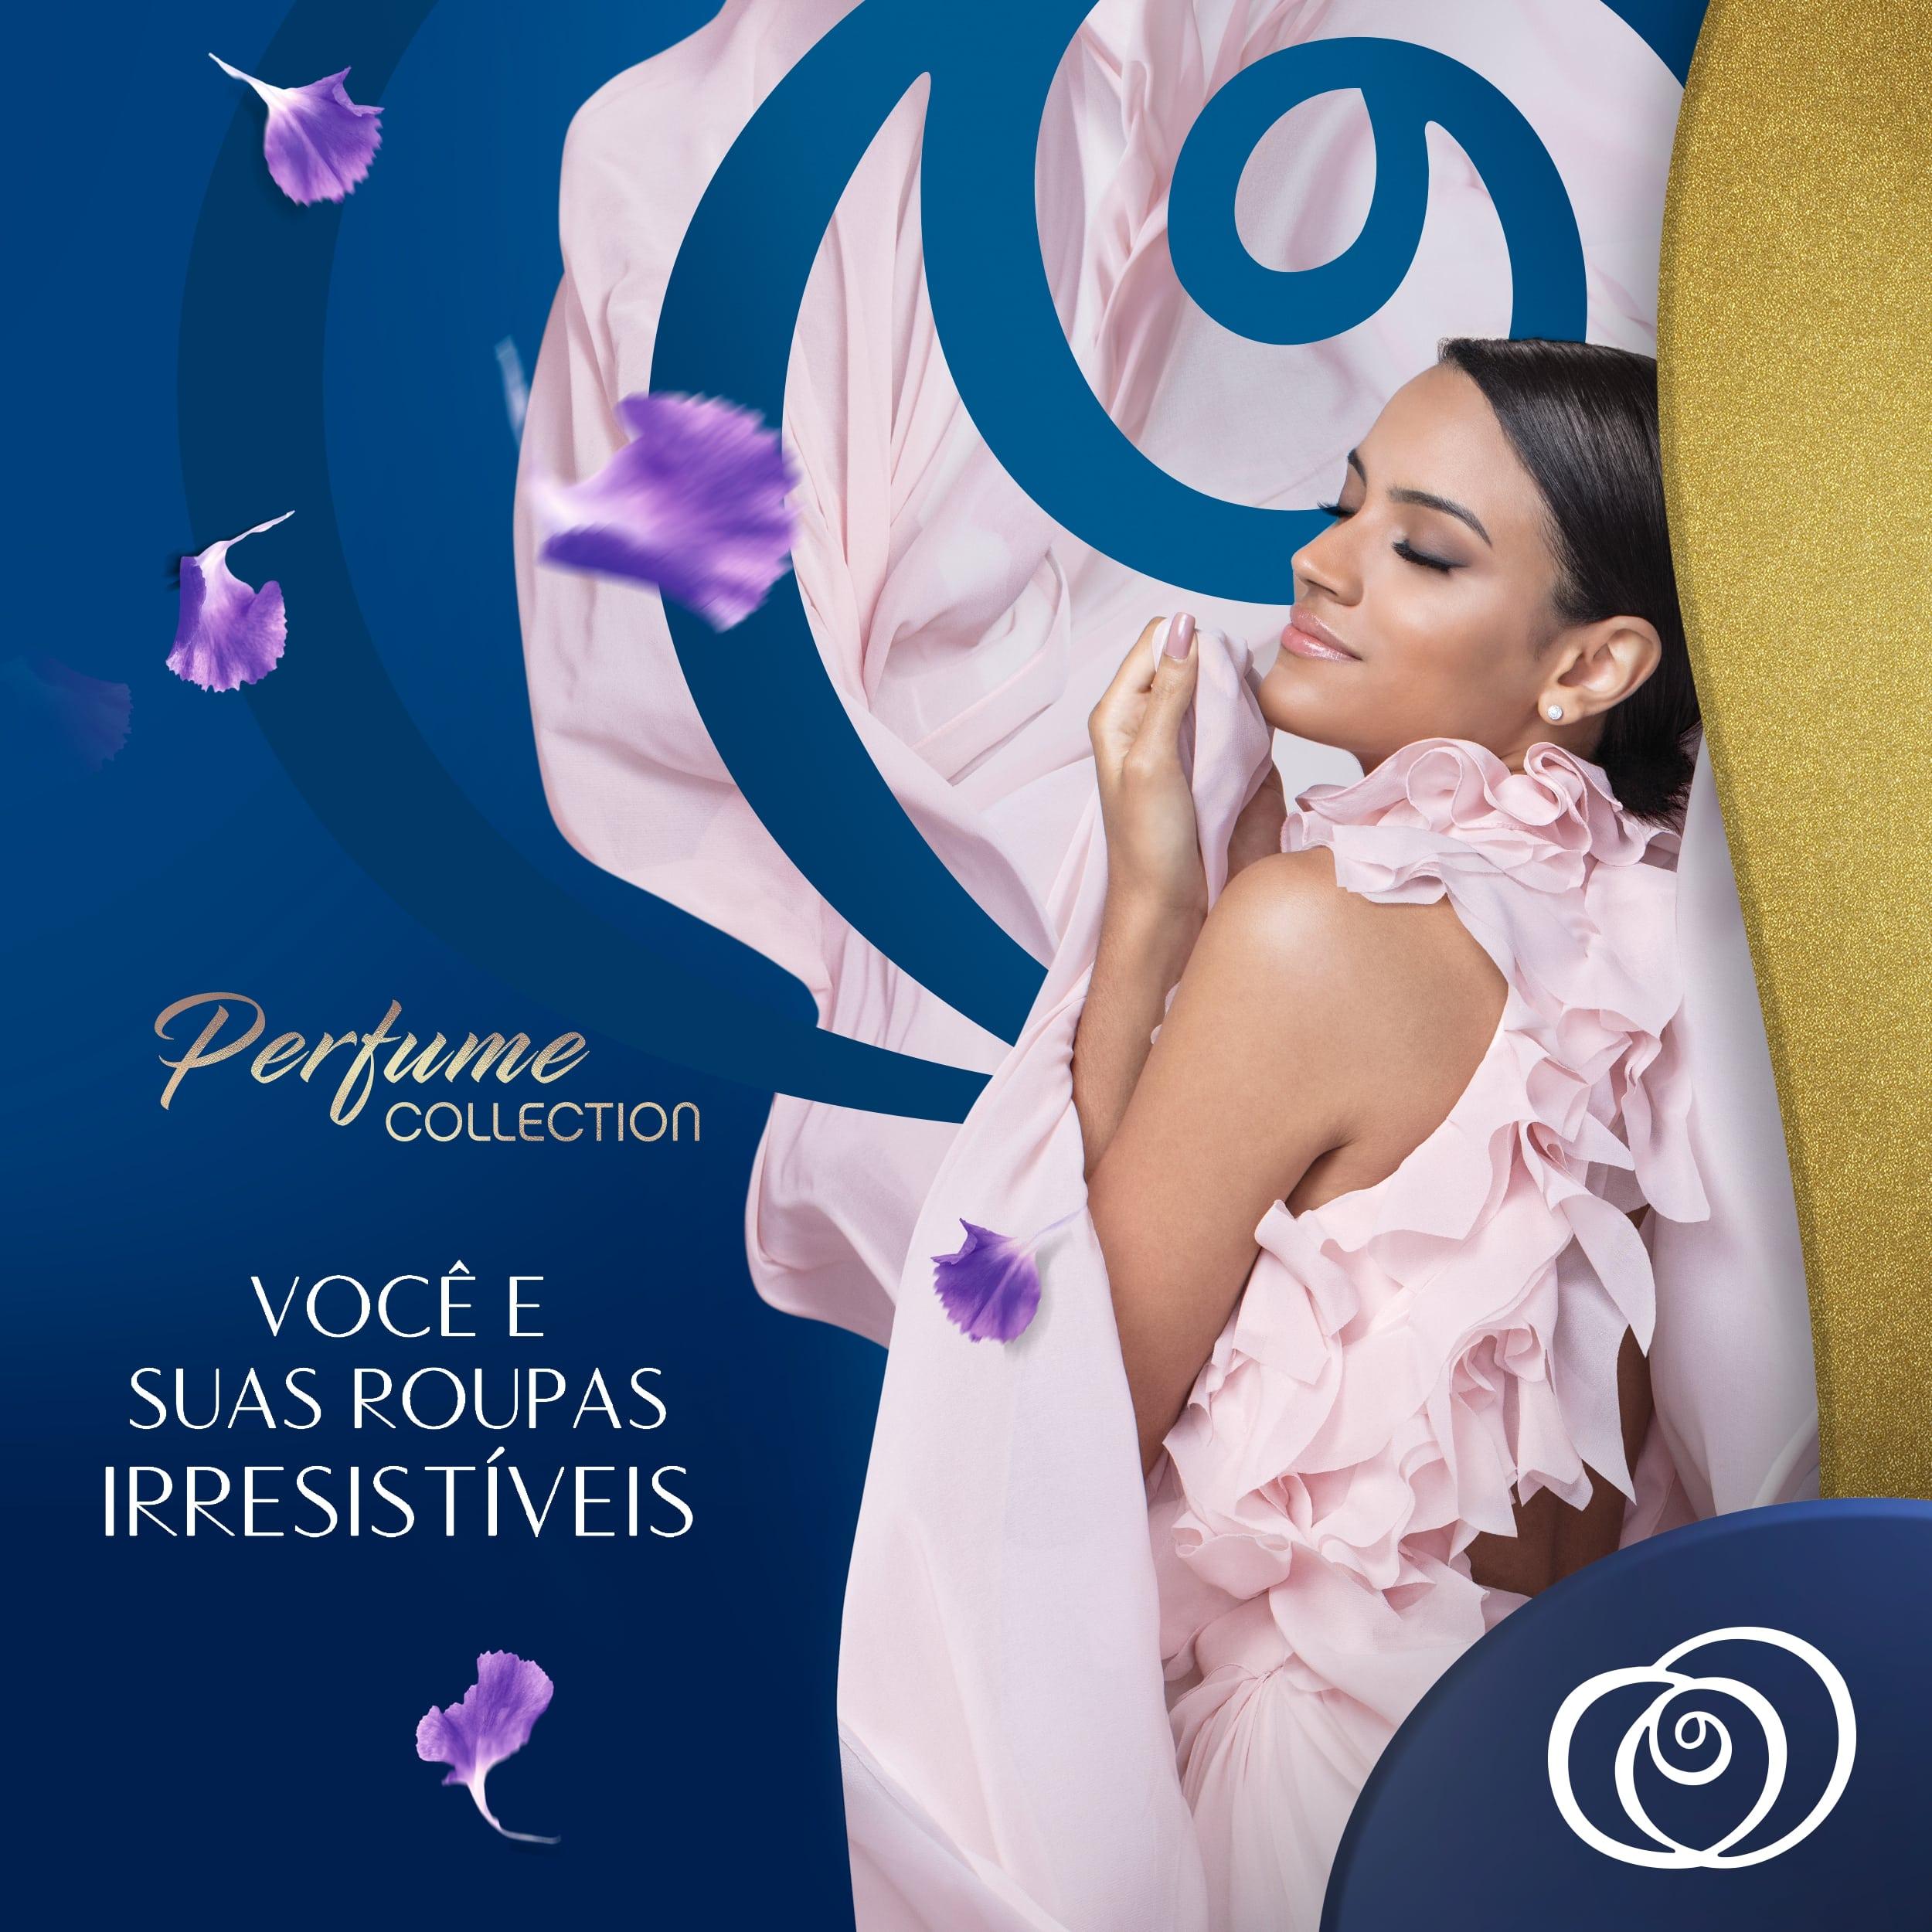 Amaciante Downy Perfume Collection Adorável Secondary 05